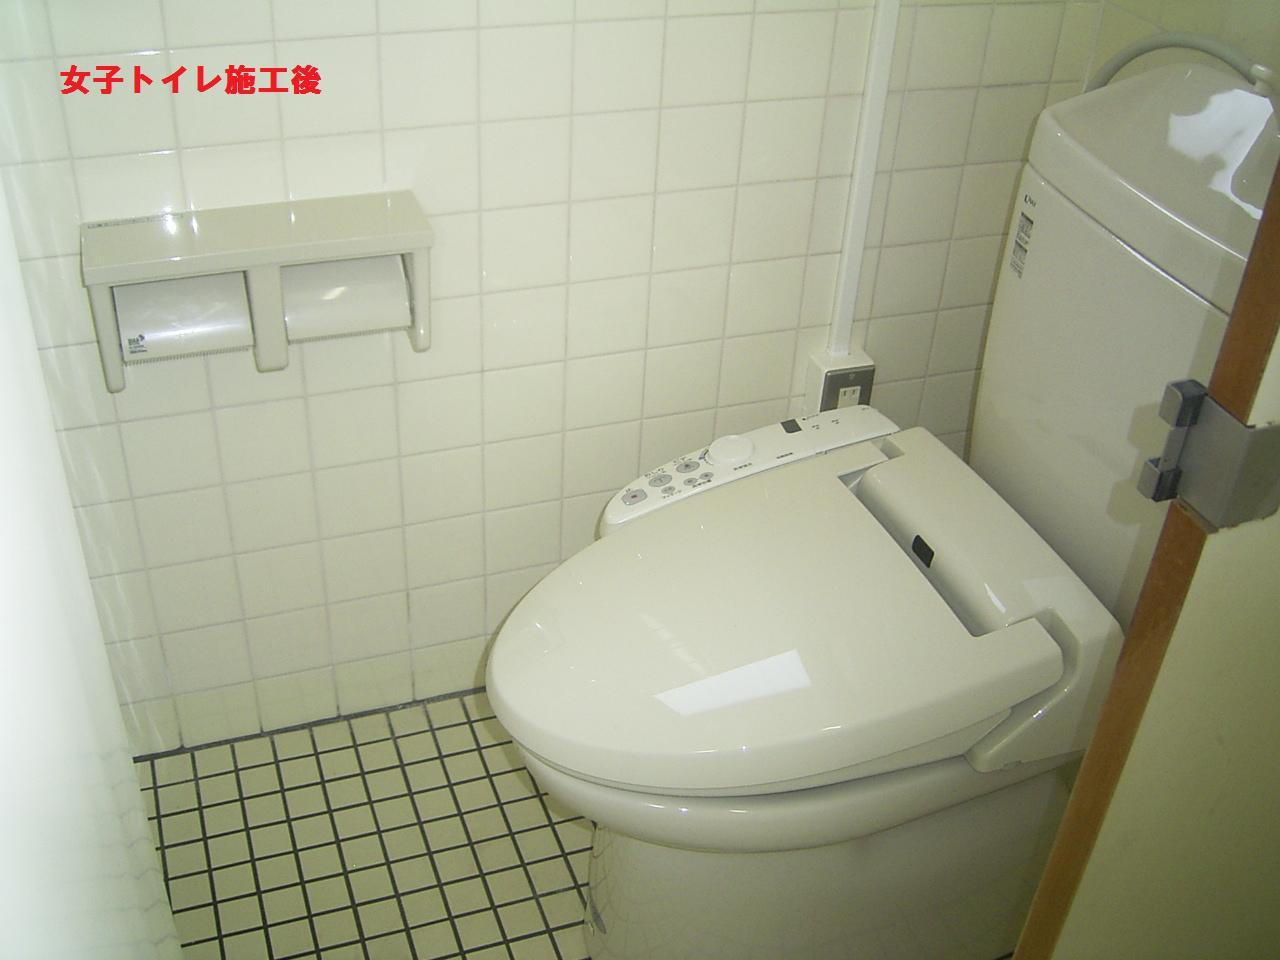 9101619acb837 今回は和式トイレ⇒洋式トイレの交換工事を行いました男子トイレと女子トイレの両方を施工男子トイレは和式便器と床の間には、立って小便をするため段差があります女子  ...